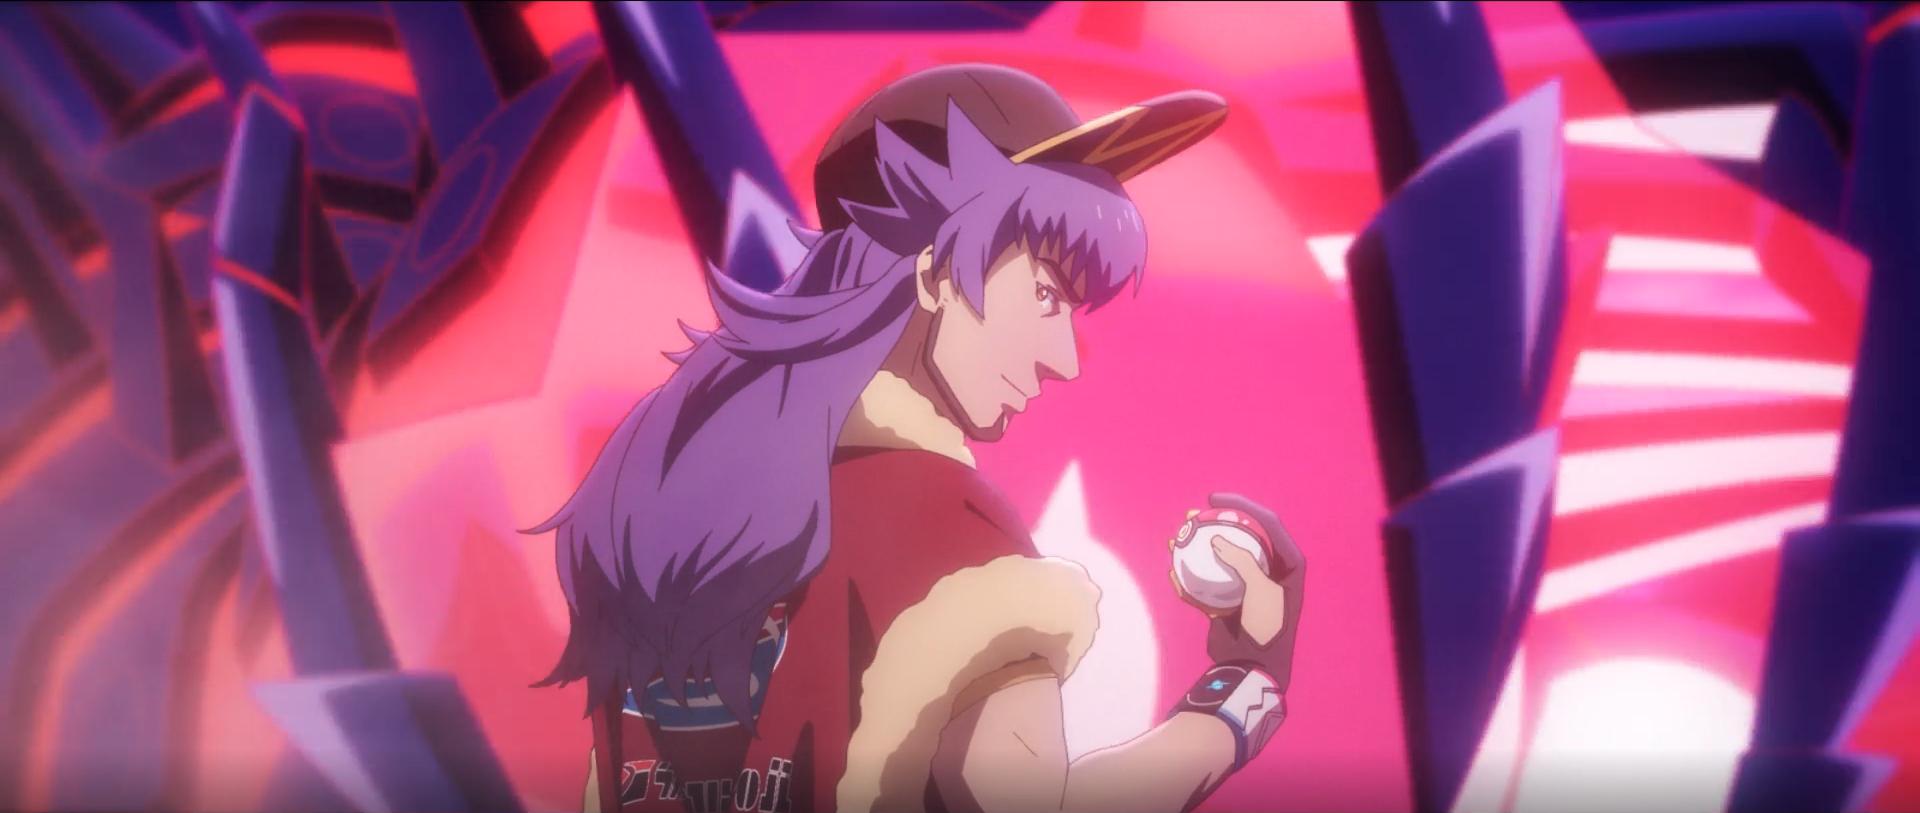 Leon in the animated Pokemon Evolutions series